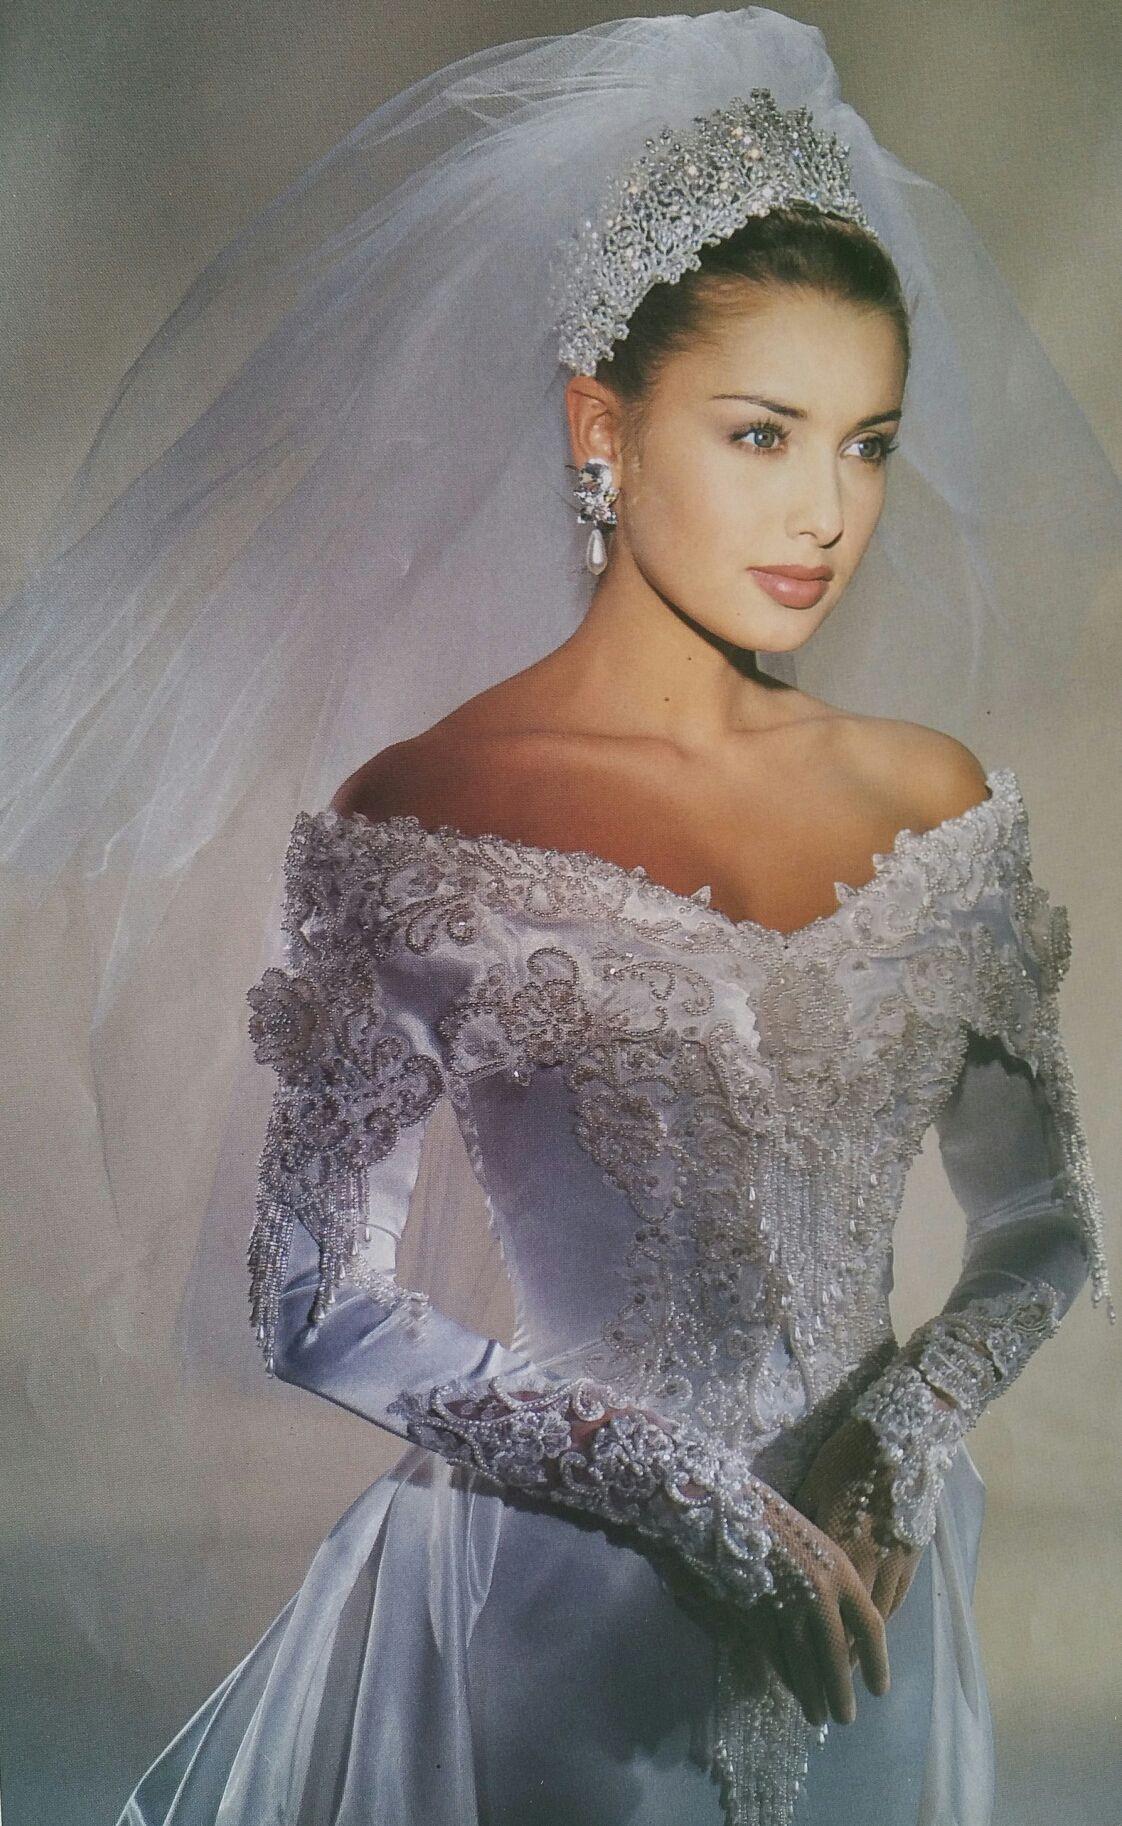 Demetrios Wedding Veils  Demetrios 1995 close bodice view With images